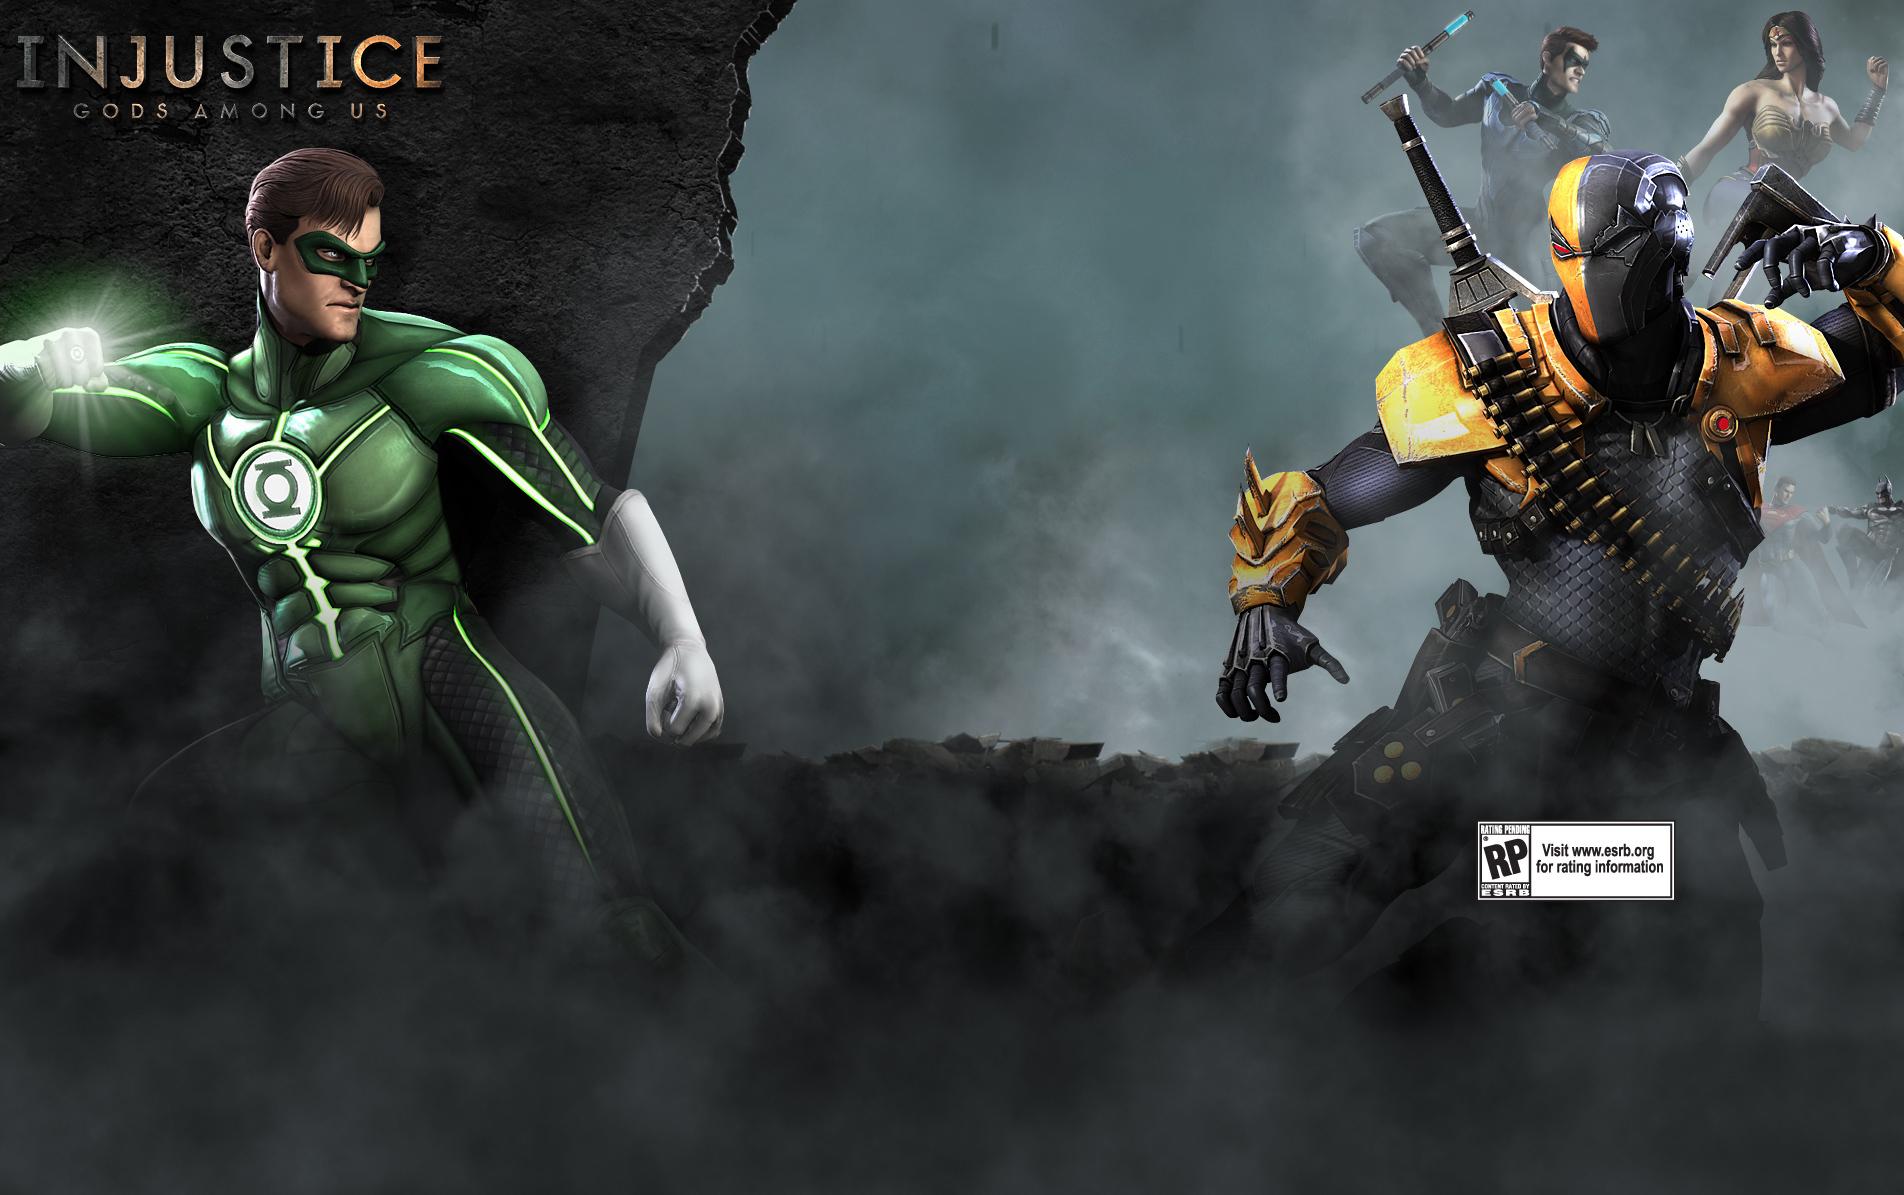 Green Arrow Wallpaper Hd Injustice Gods Among Us Deathstroke Artwork